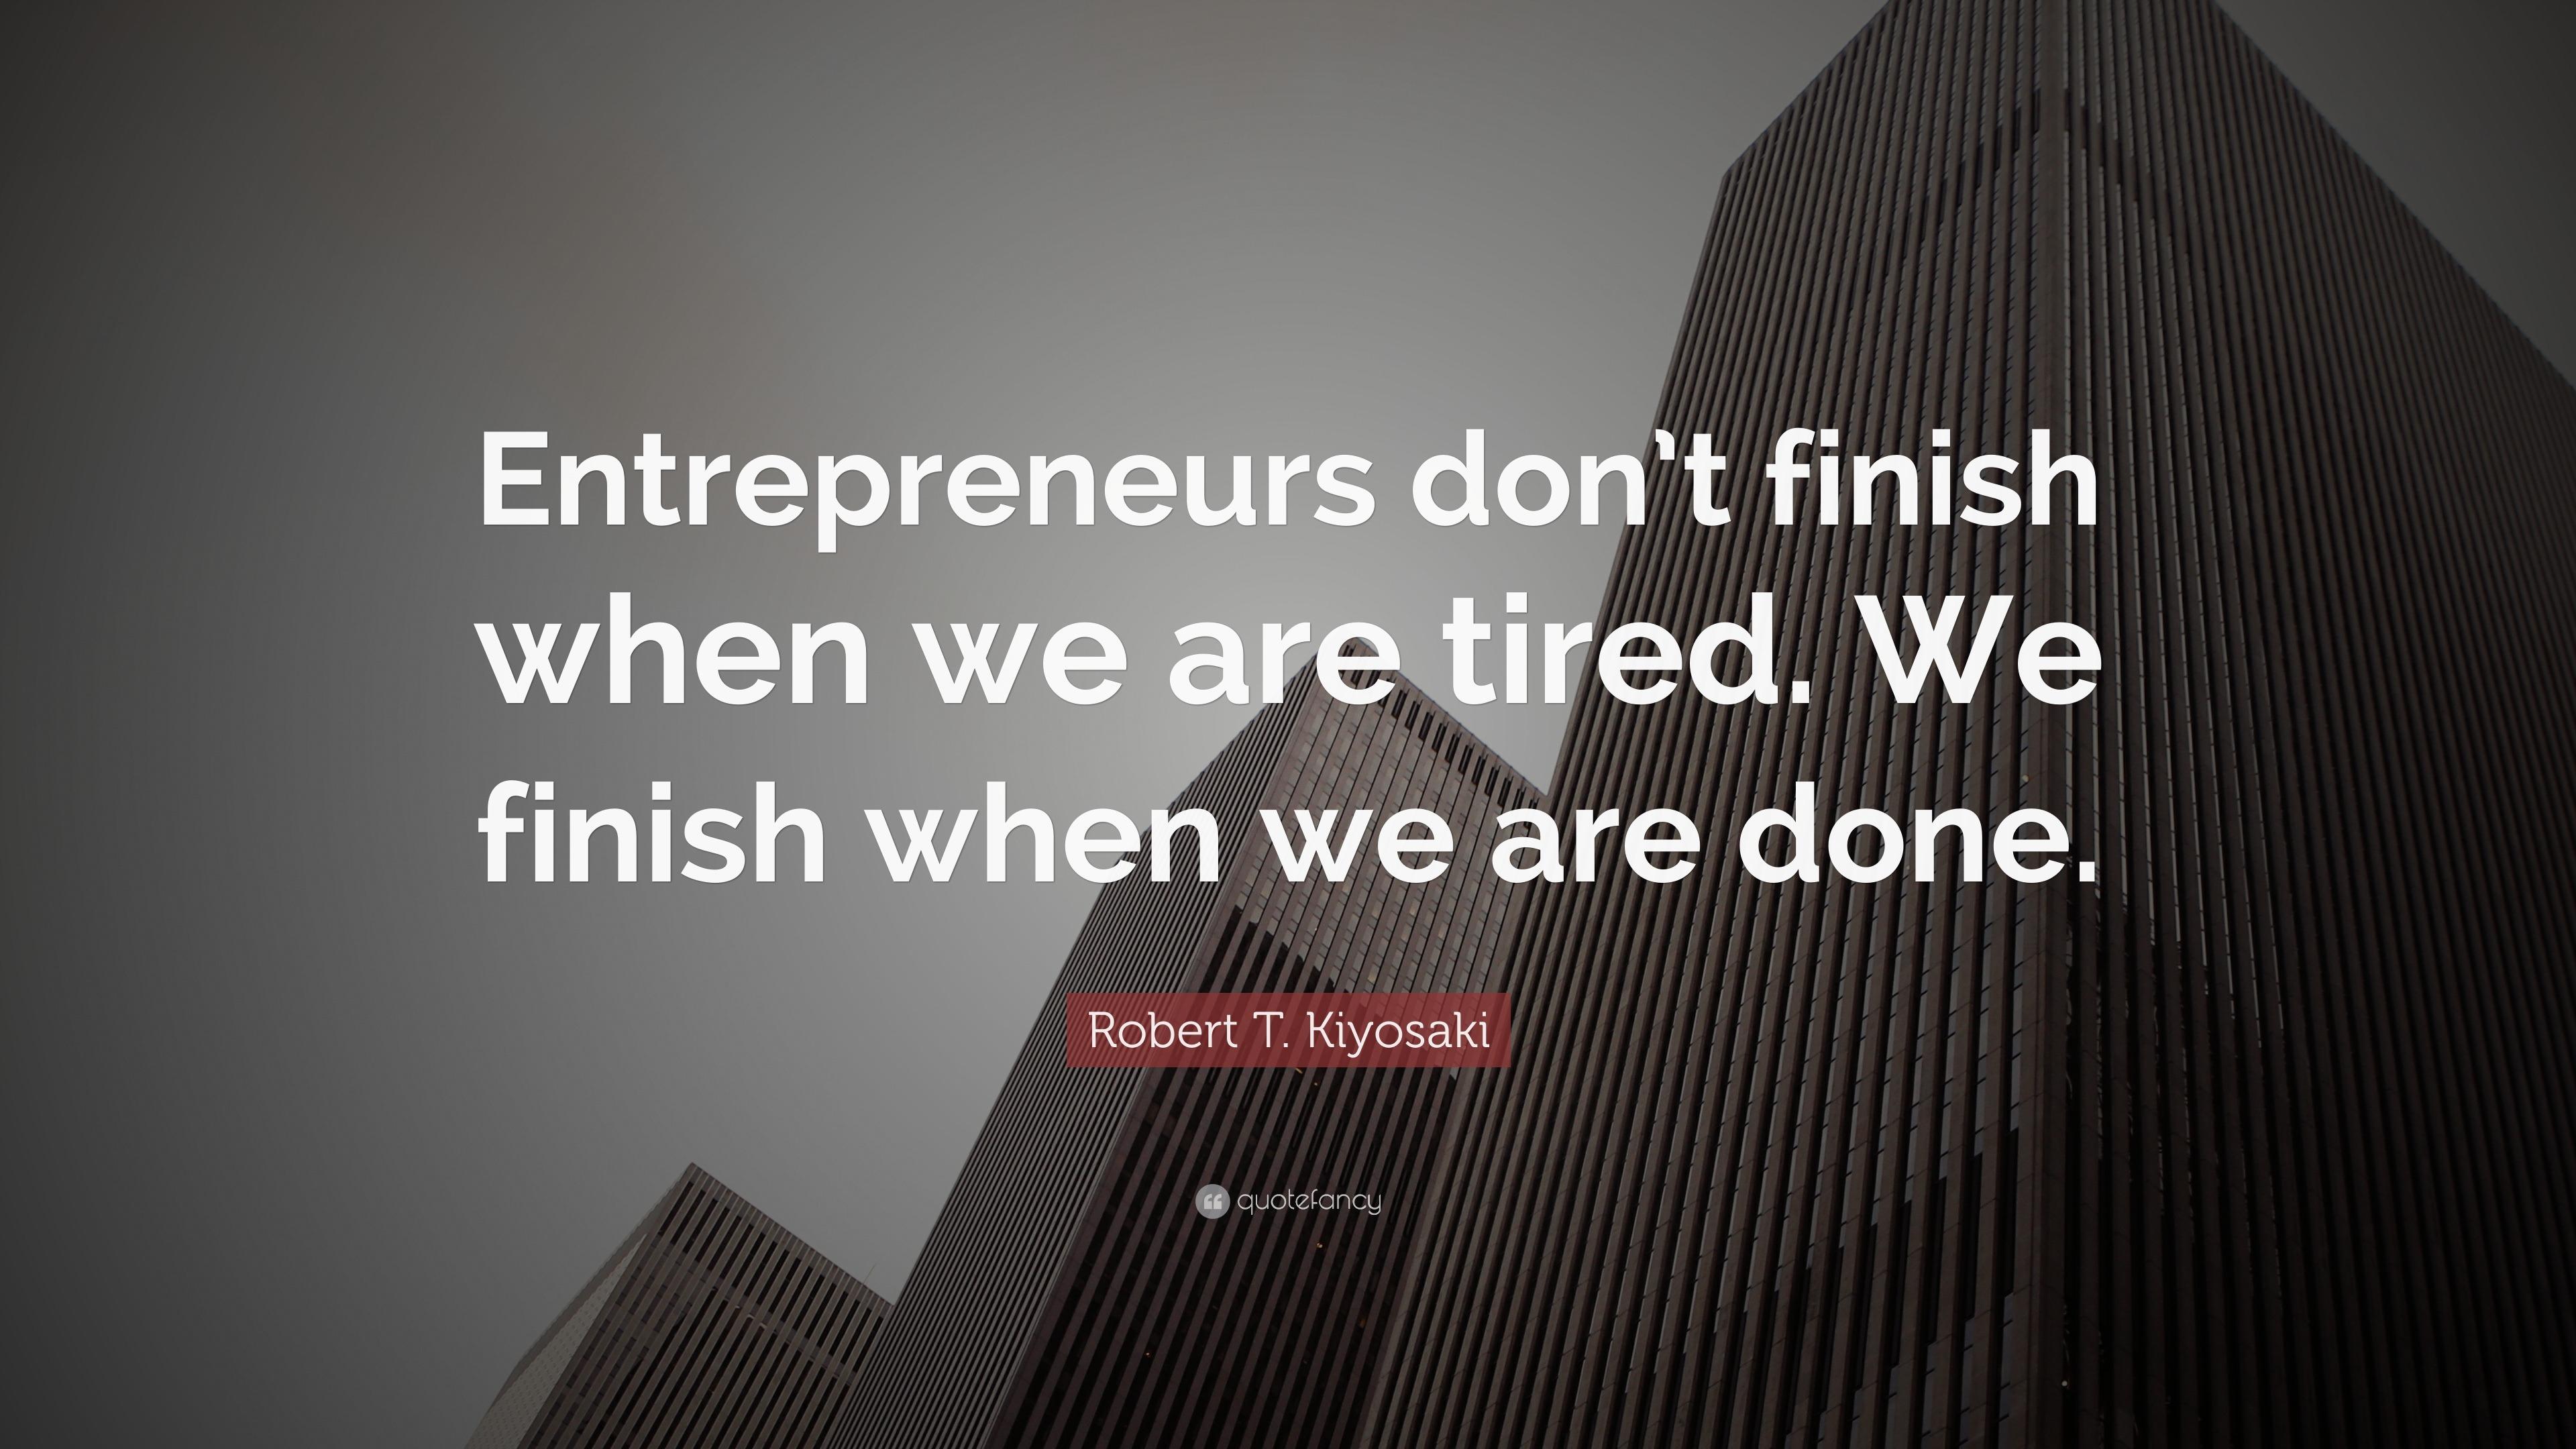 Inspirational entrepreneurship quotes 100 wallpapers quotefancy - Entrepreneur wallpaper ...